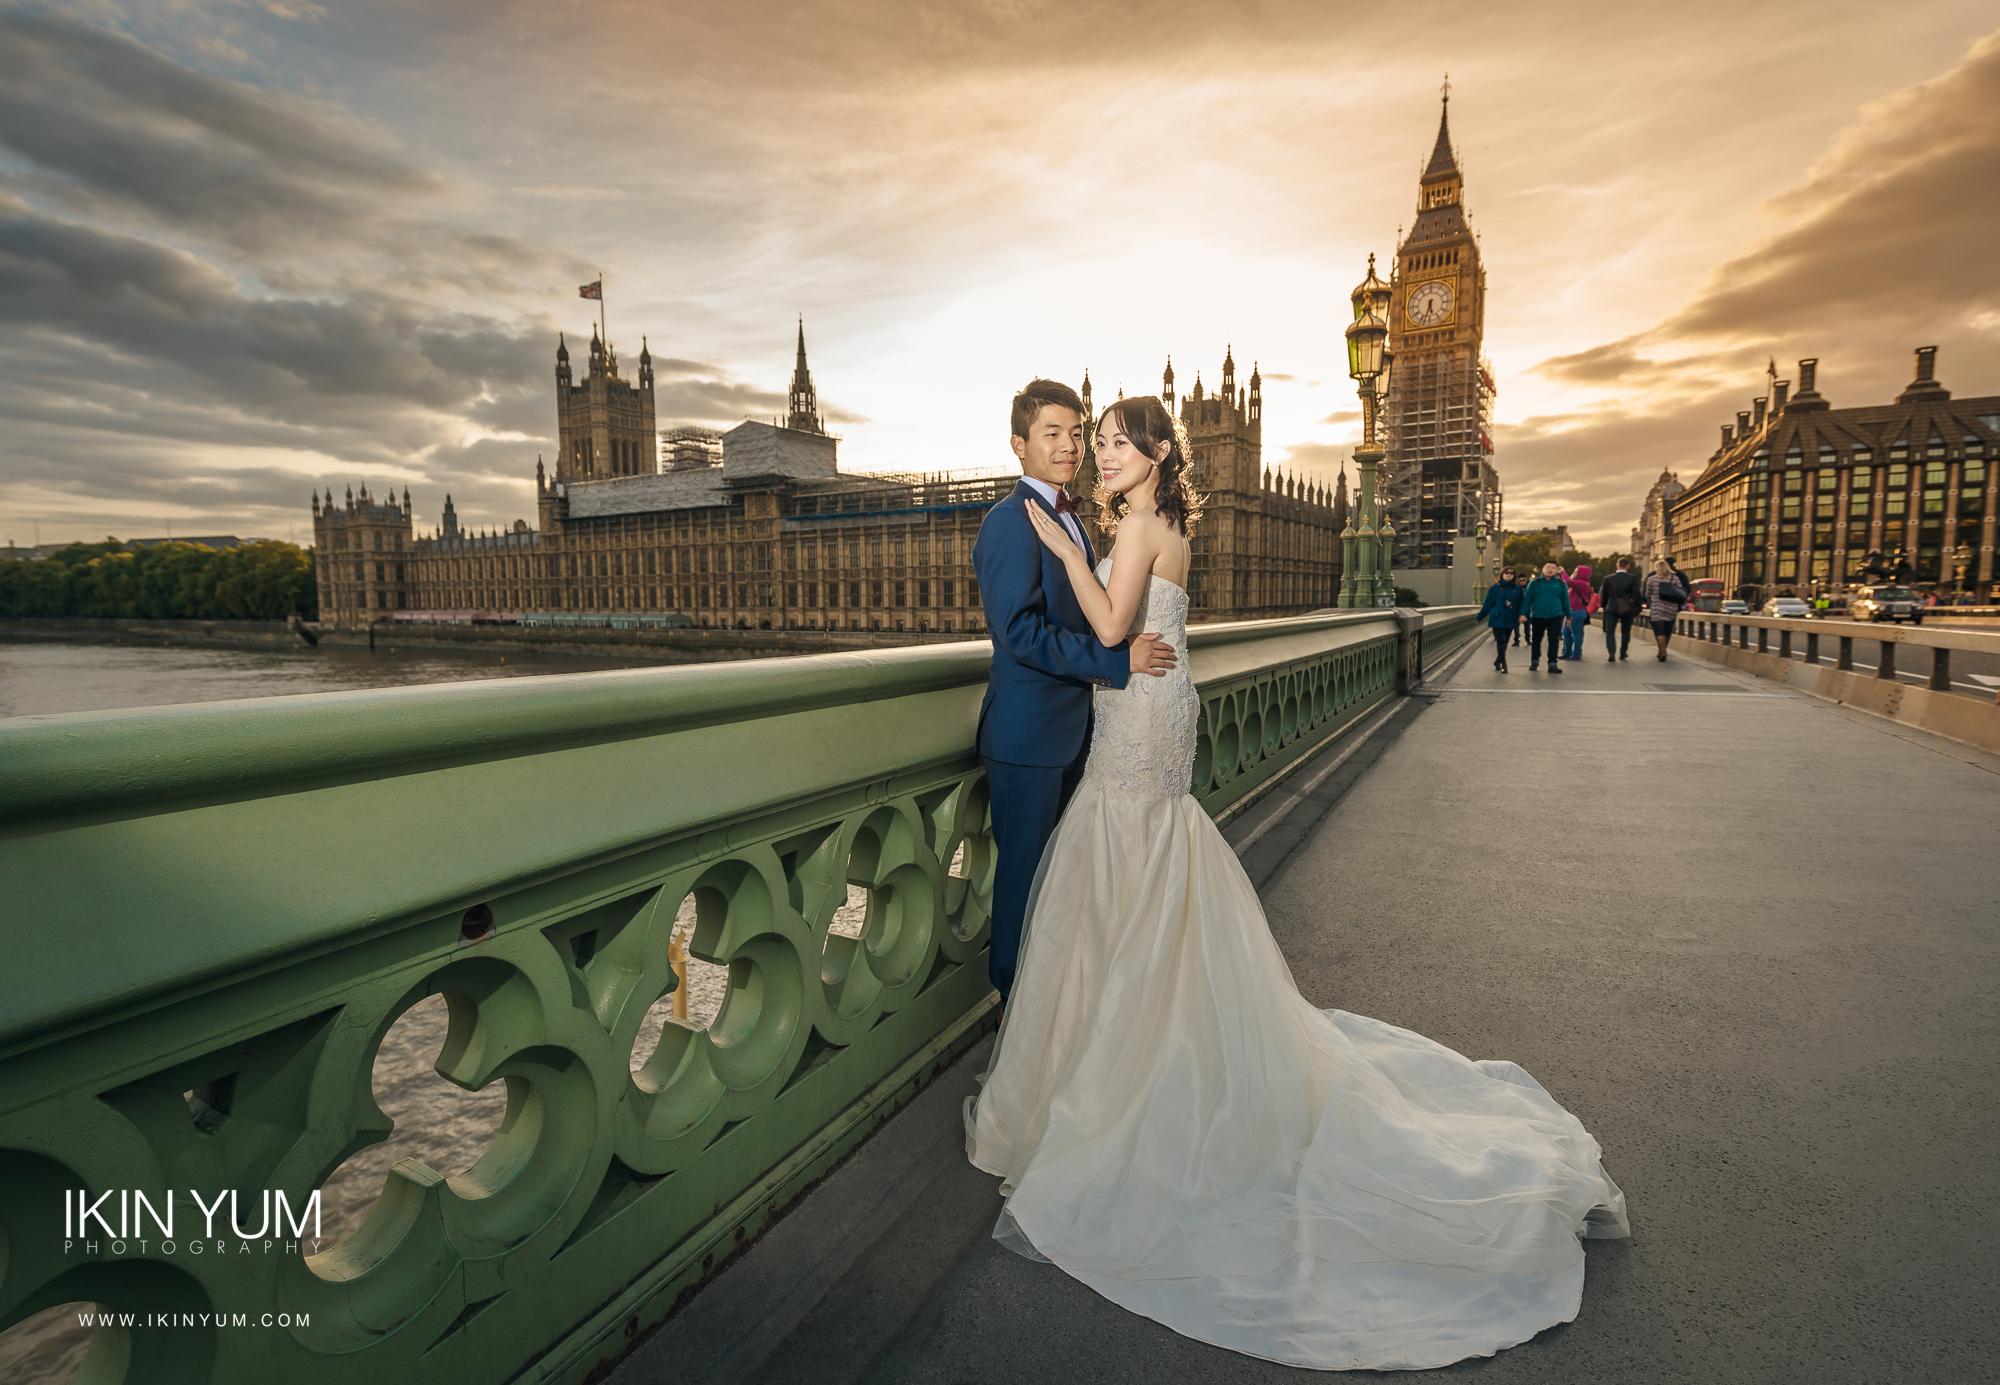 Chloe & Carlos Pre-Wedding Shoot- Ikin Yum Photography-0106.jpg